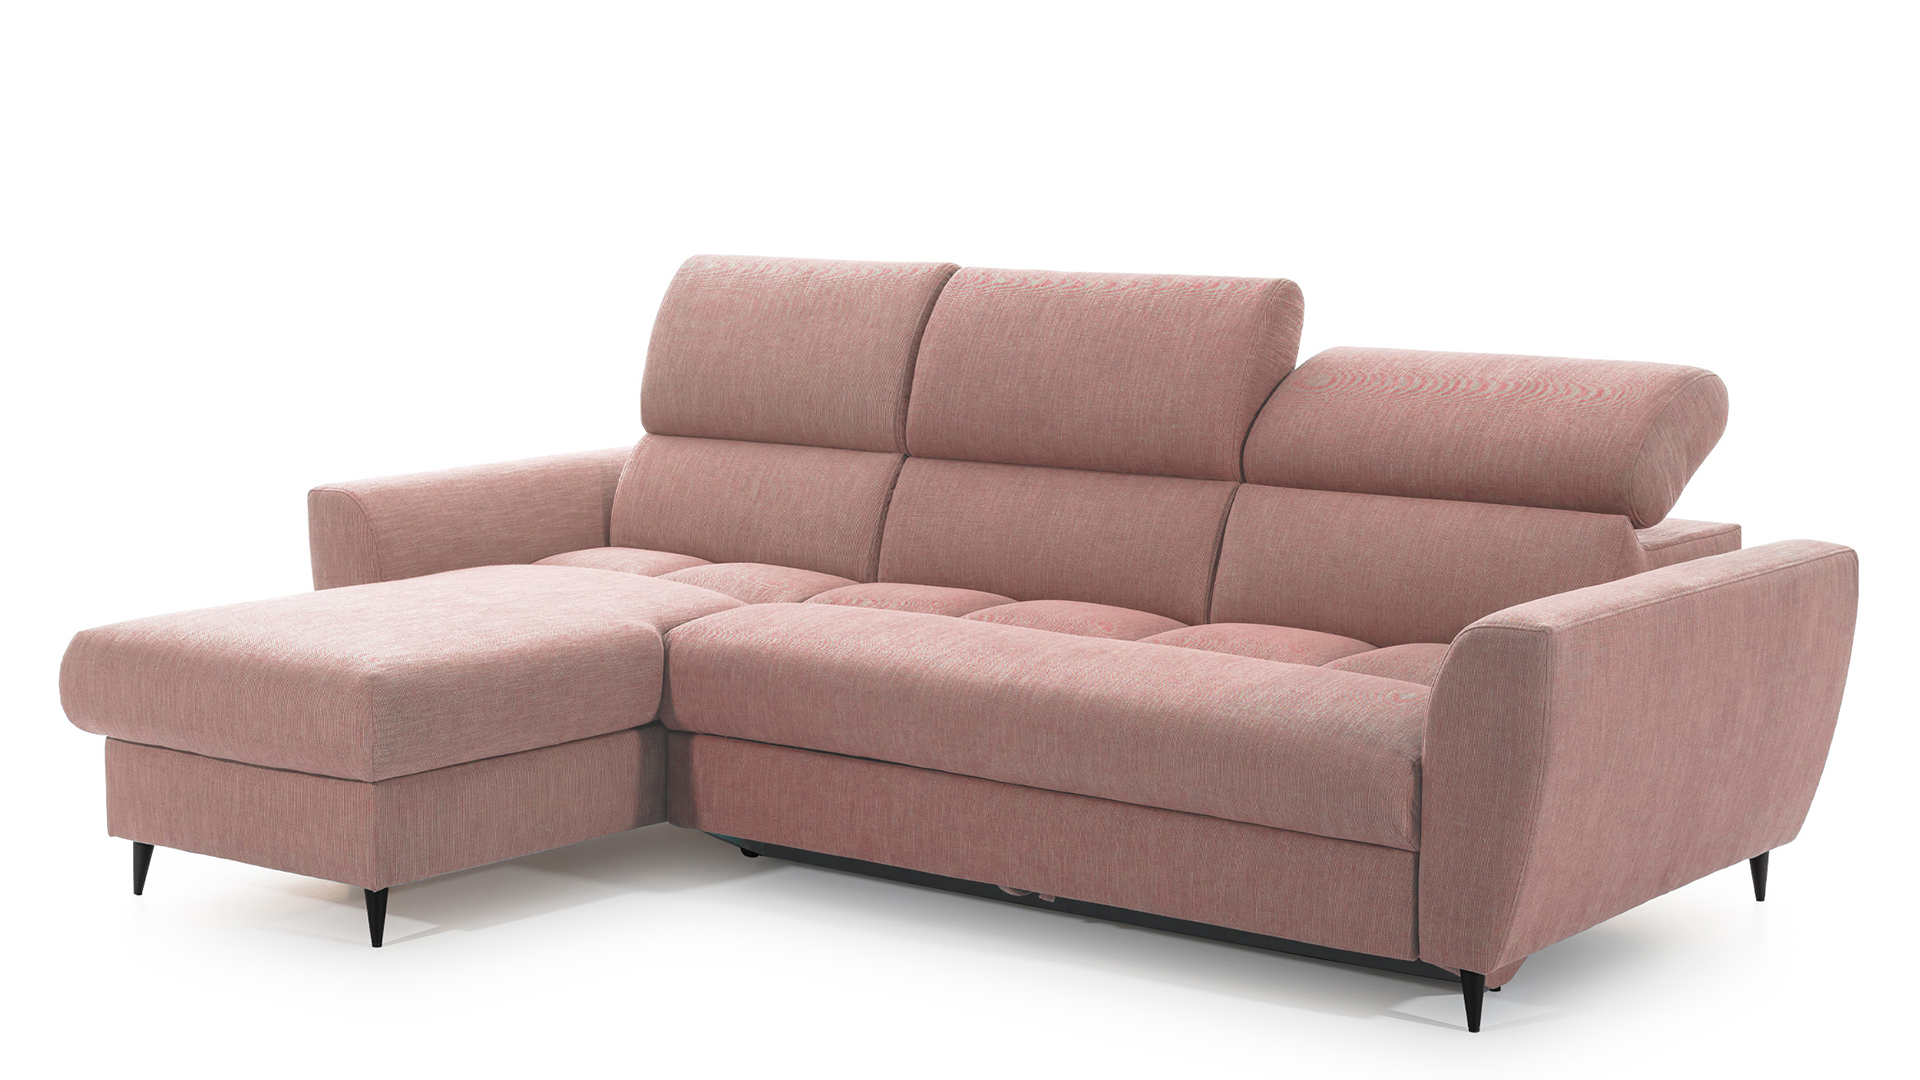 Corner sofa with sleeping function Avivo